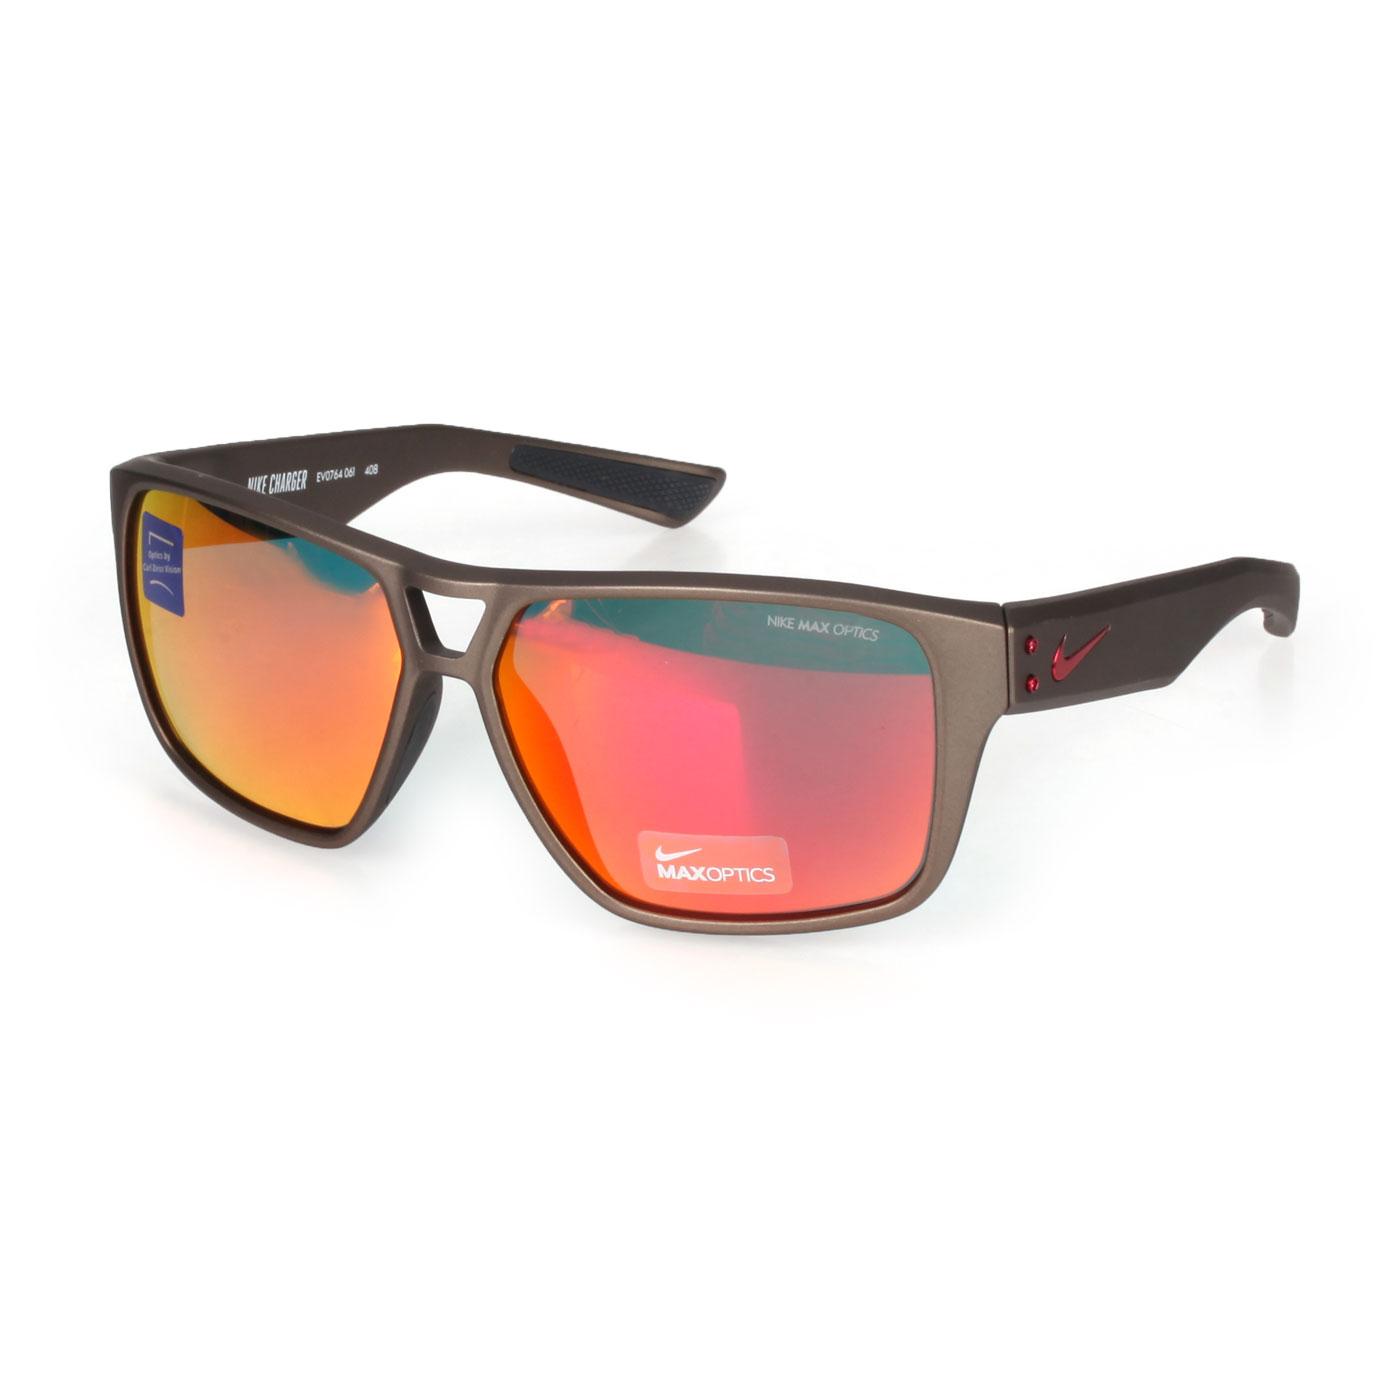 NIKE VISION CHARGER R 太陽眼鏡 EV0764-061 - 深棕紅